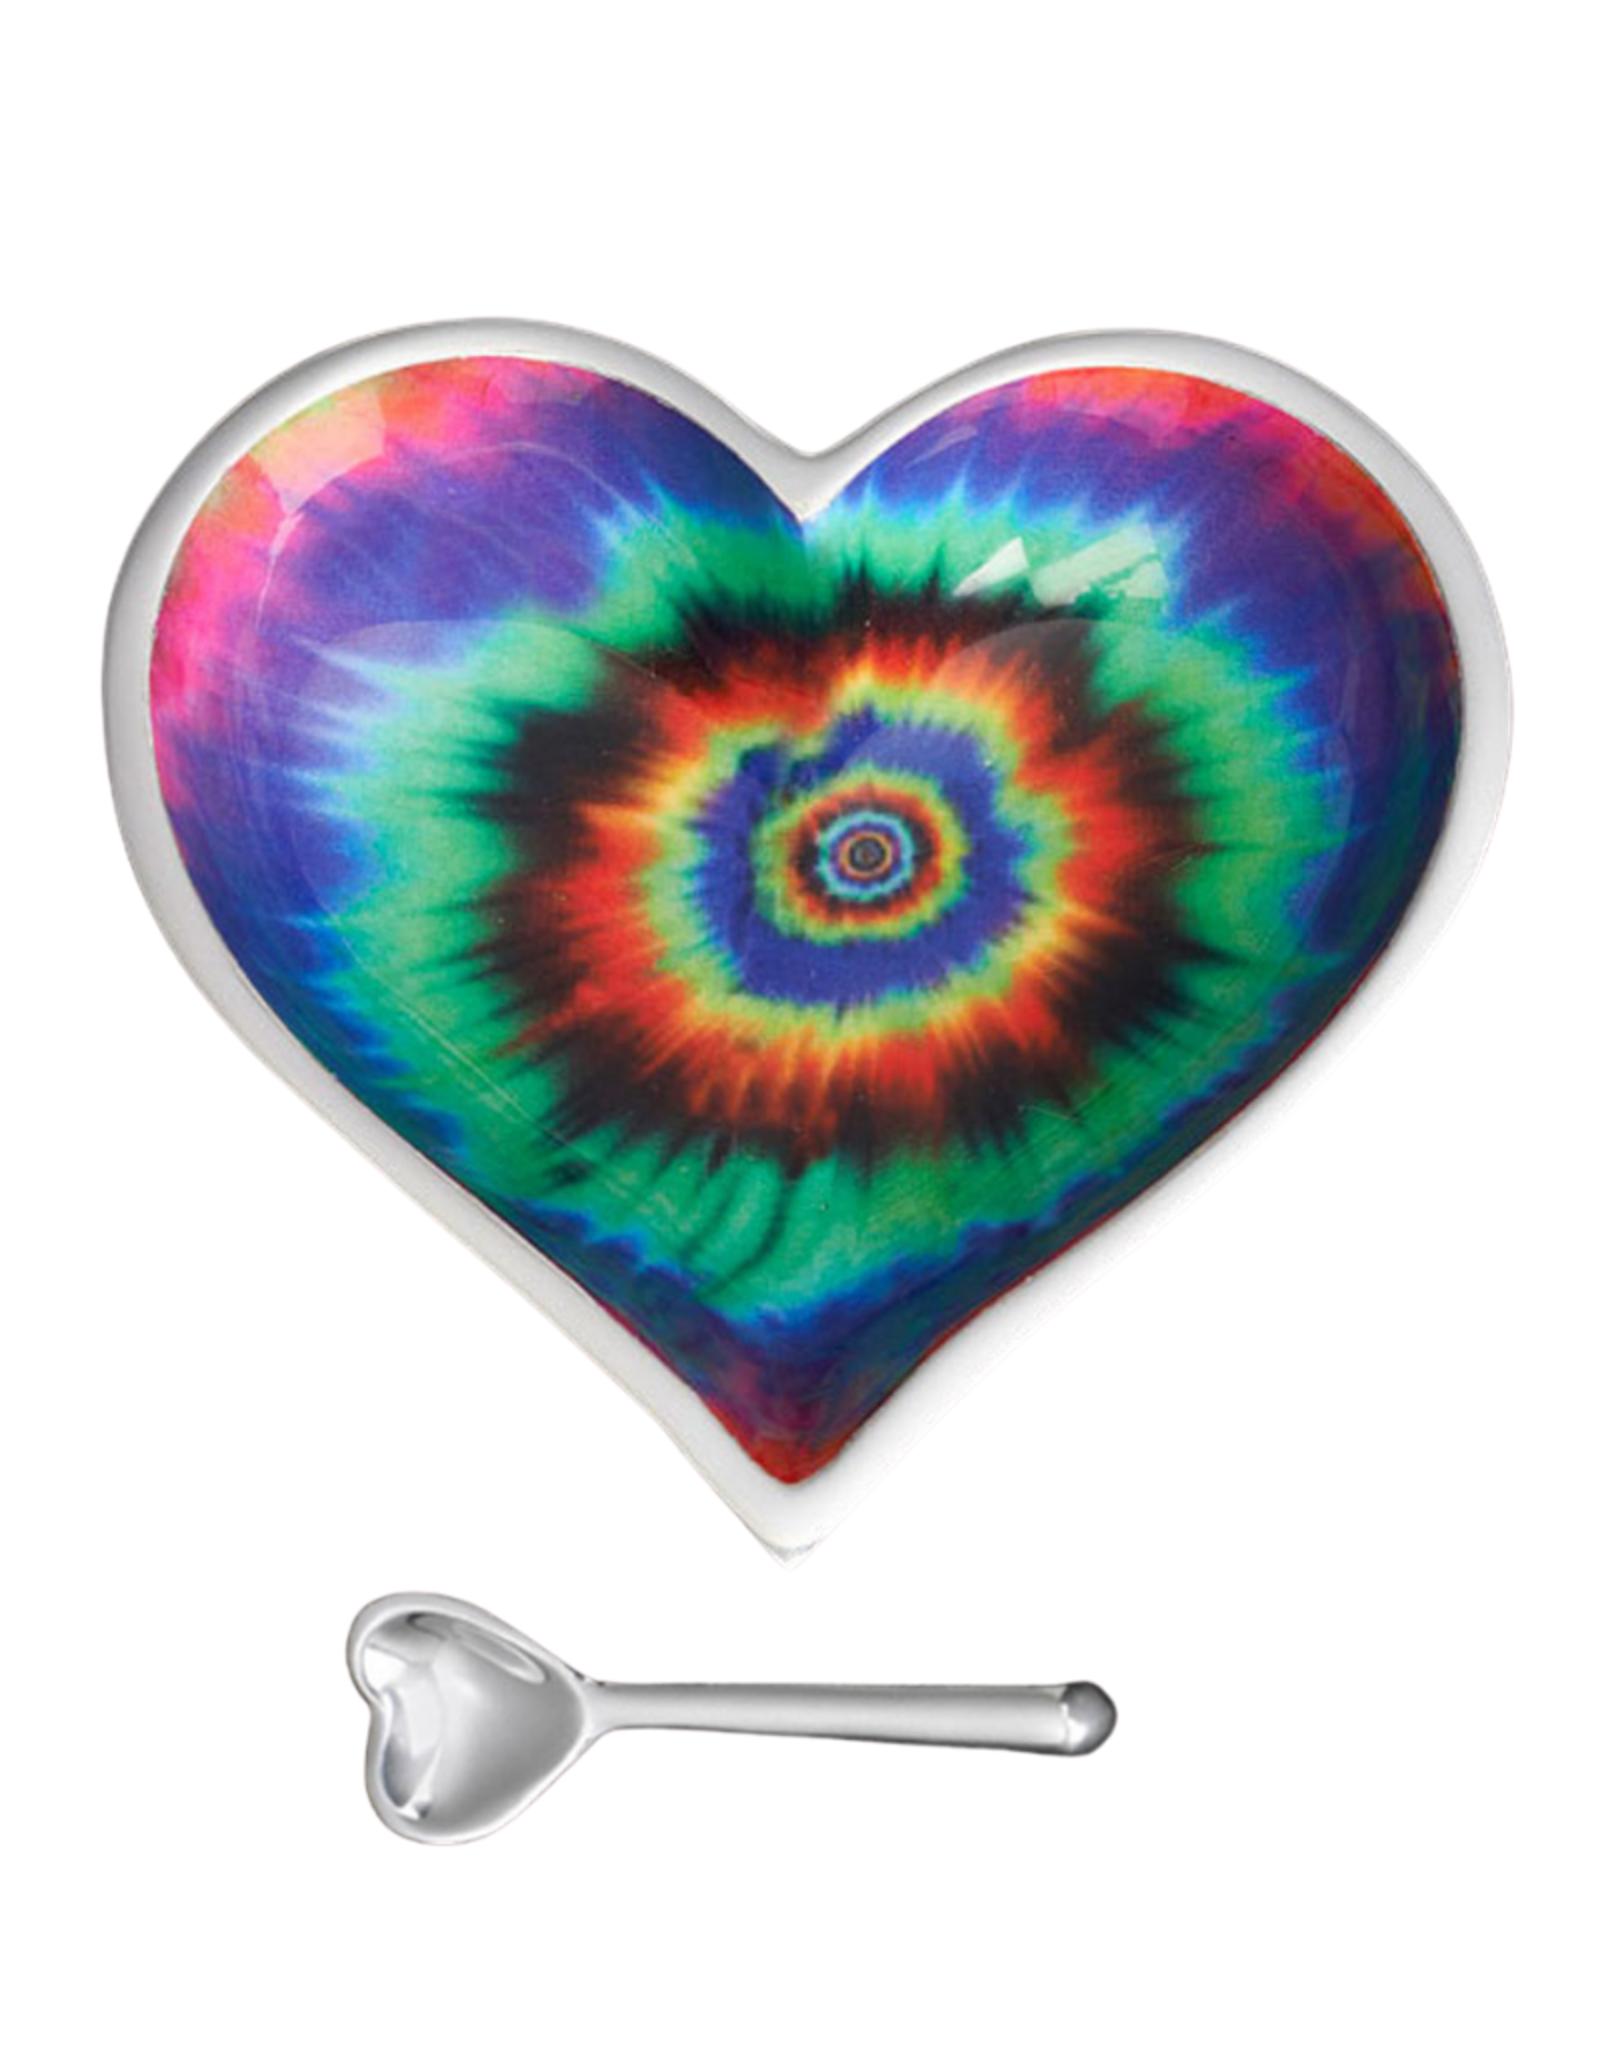 Groovy Heart Bowl & Spoon